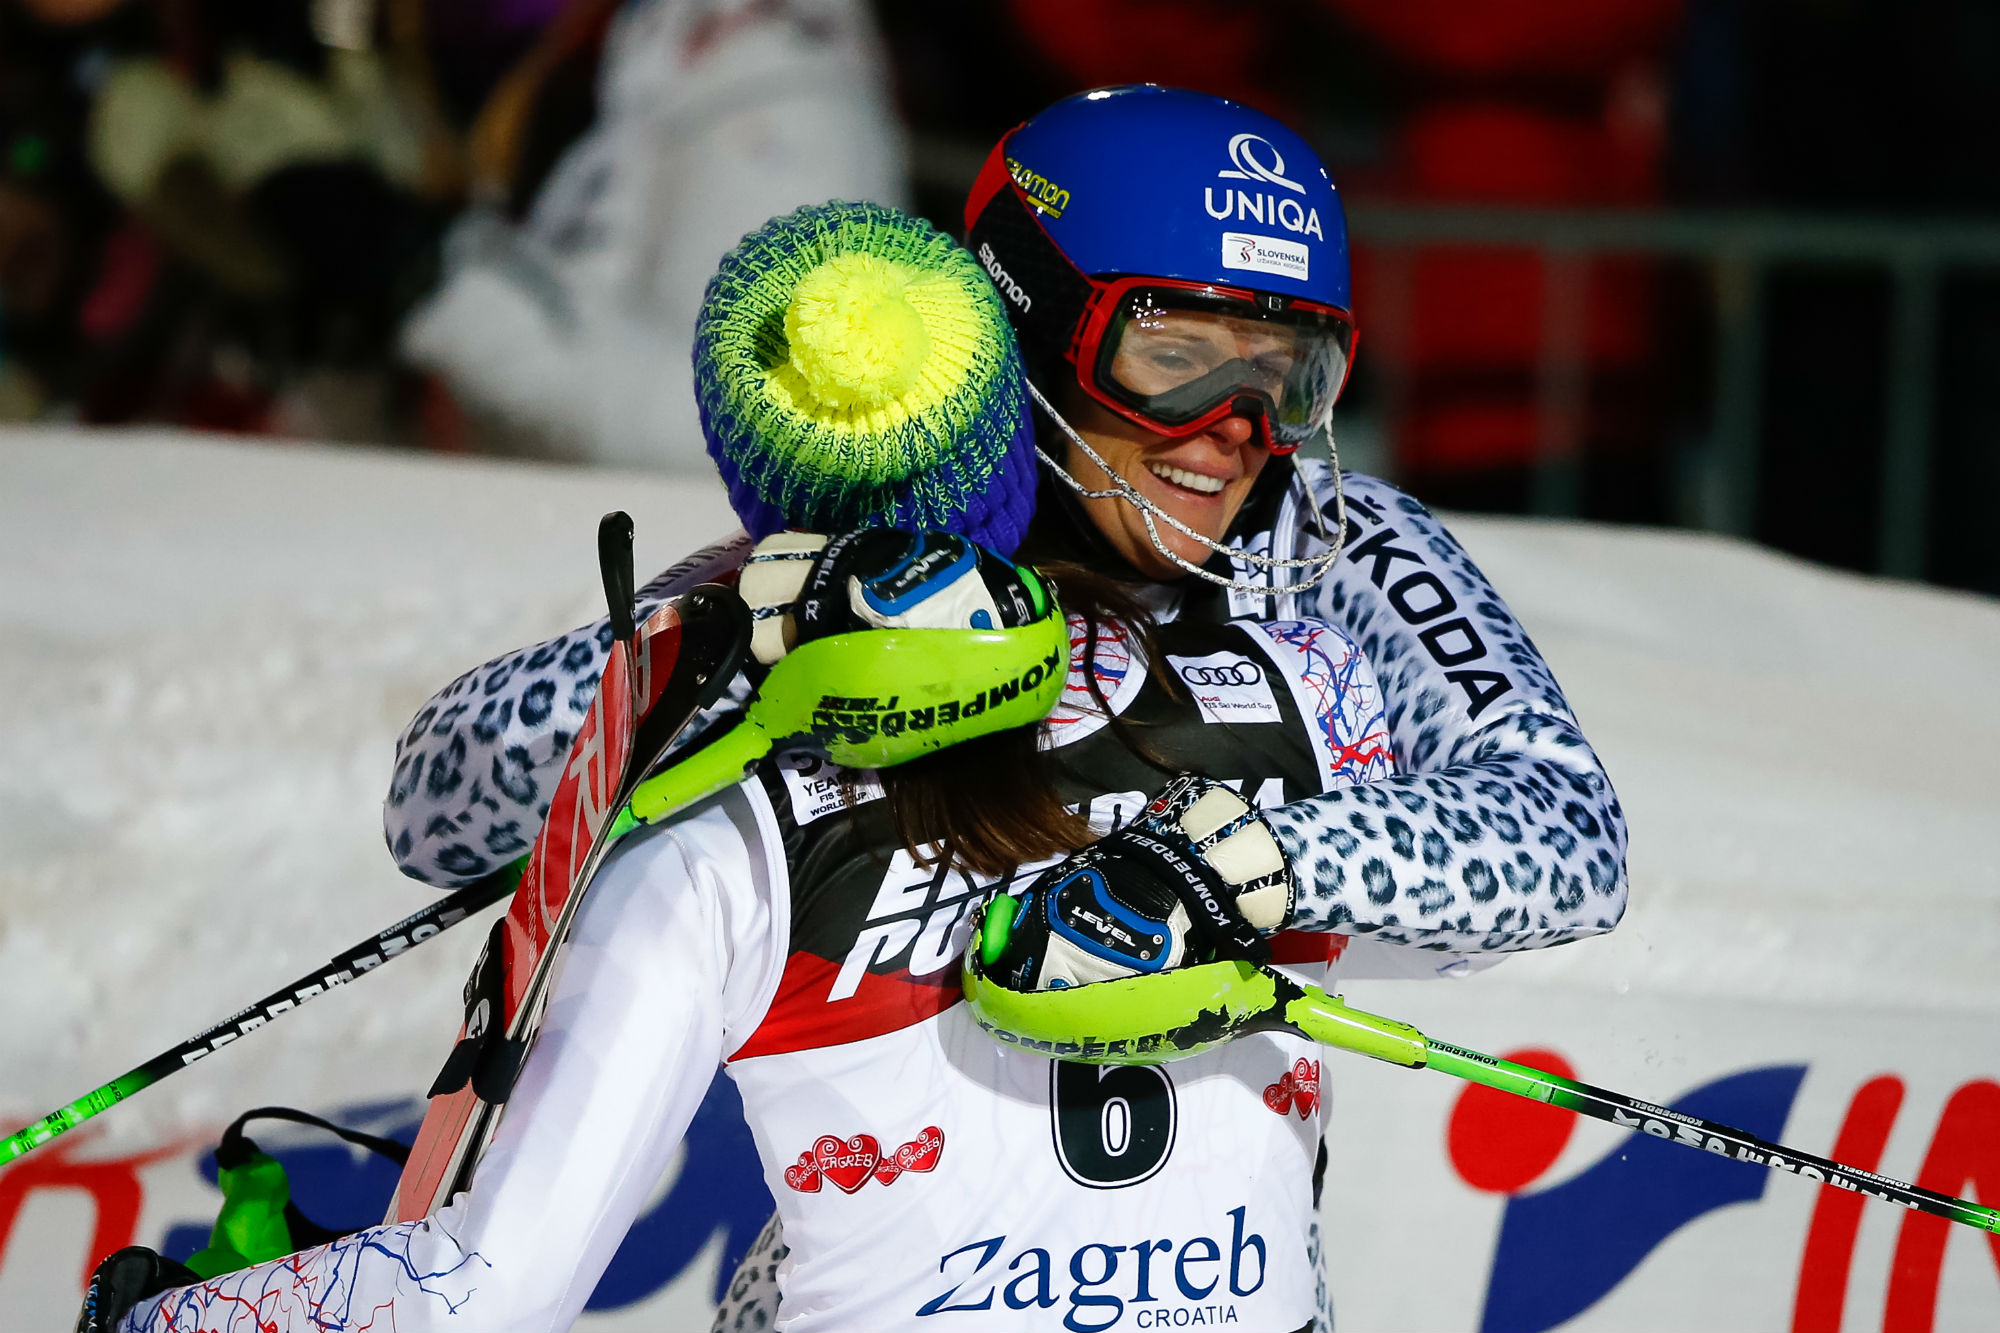 Zuzulova abbraccia Vlhova, di spalle. Slovacchia in trionfo a Zagabria (@Zoom agence)